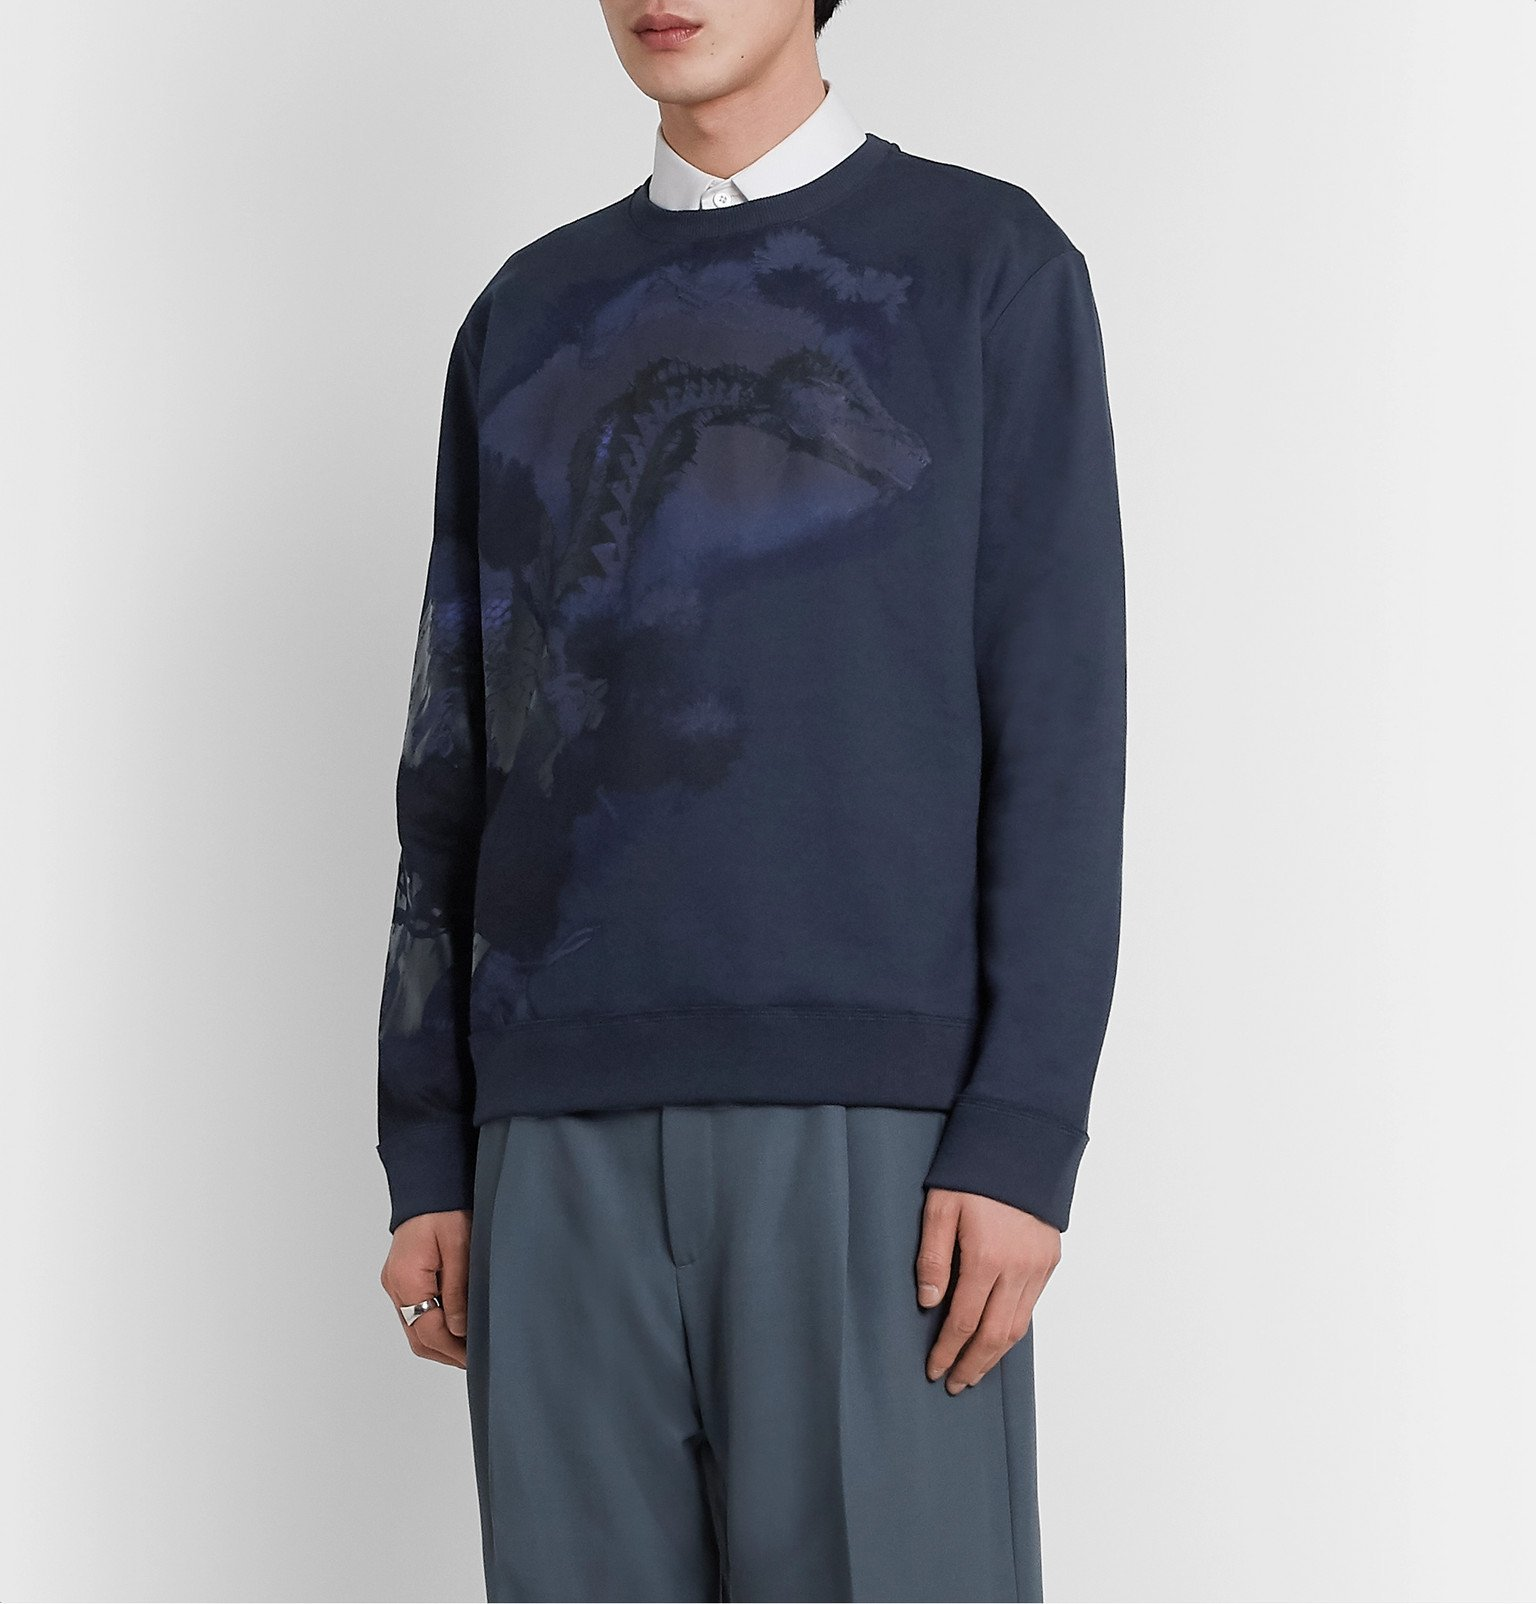 Valentino - Printed Loopback Cotton-Blend Jersey Sweatshirt - Blue